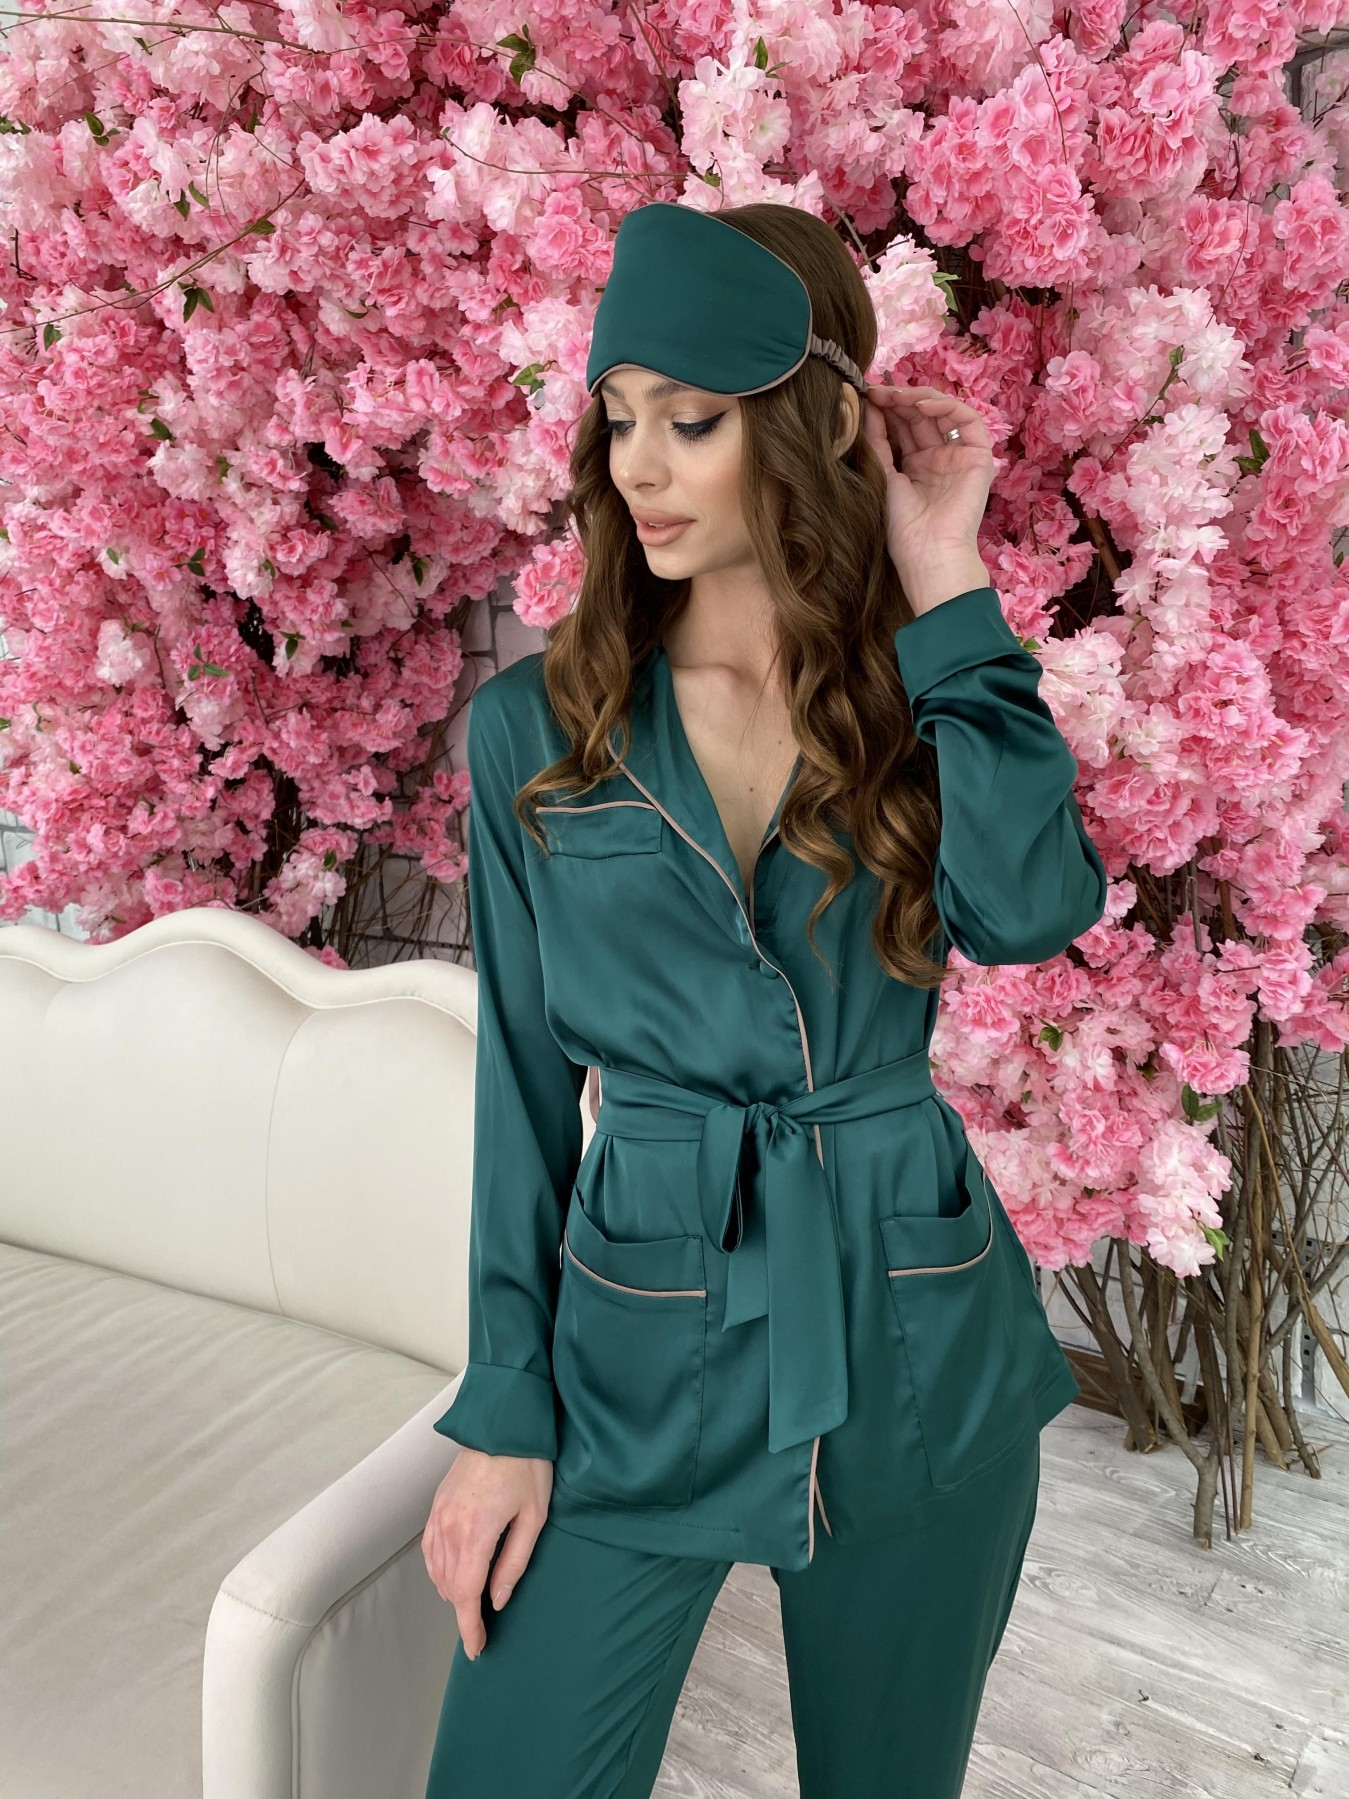 Шайн костюм из шелка  10778 АРТ. 47212 Цвет: Темно зеленый - фото 3, интернет магазин tm-modus.ru